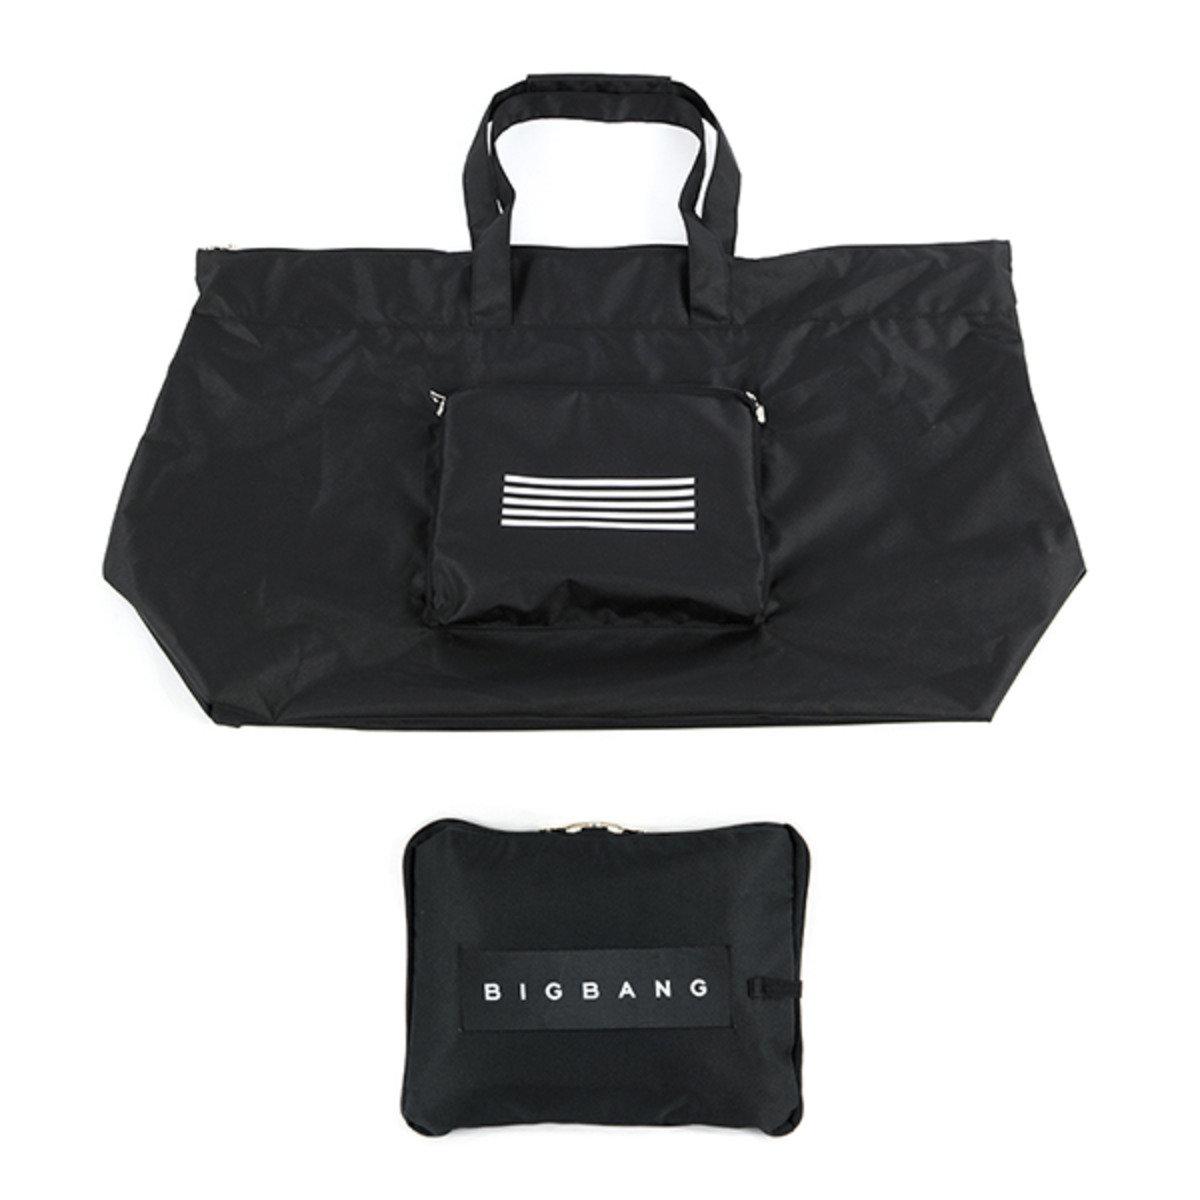 BIGBANG 旅行袋 [BIGBANG 2015 CONCERT MD]_GD00018440